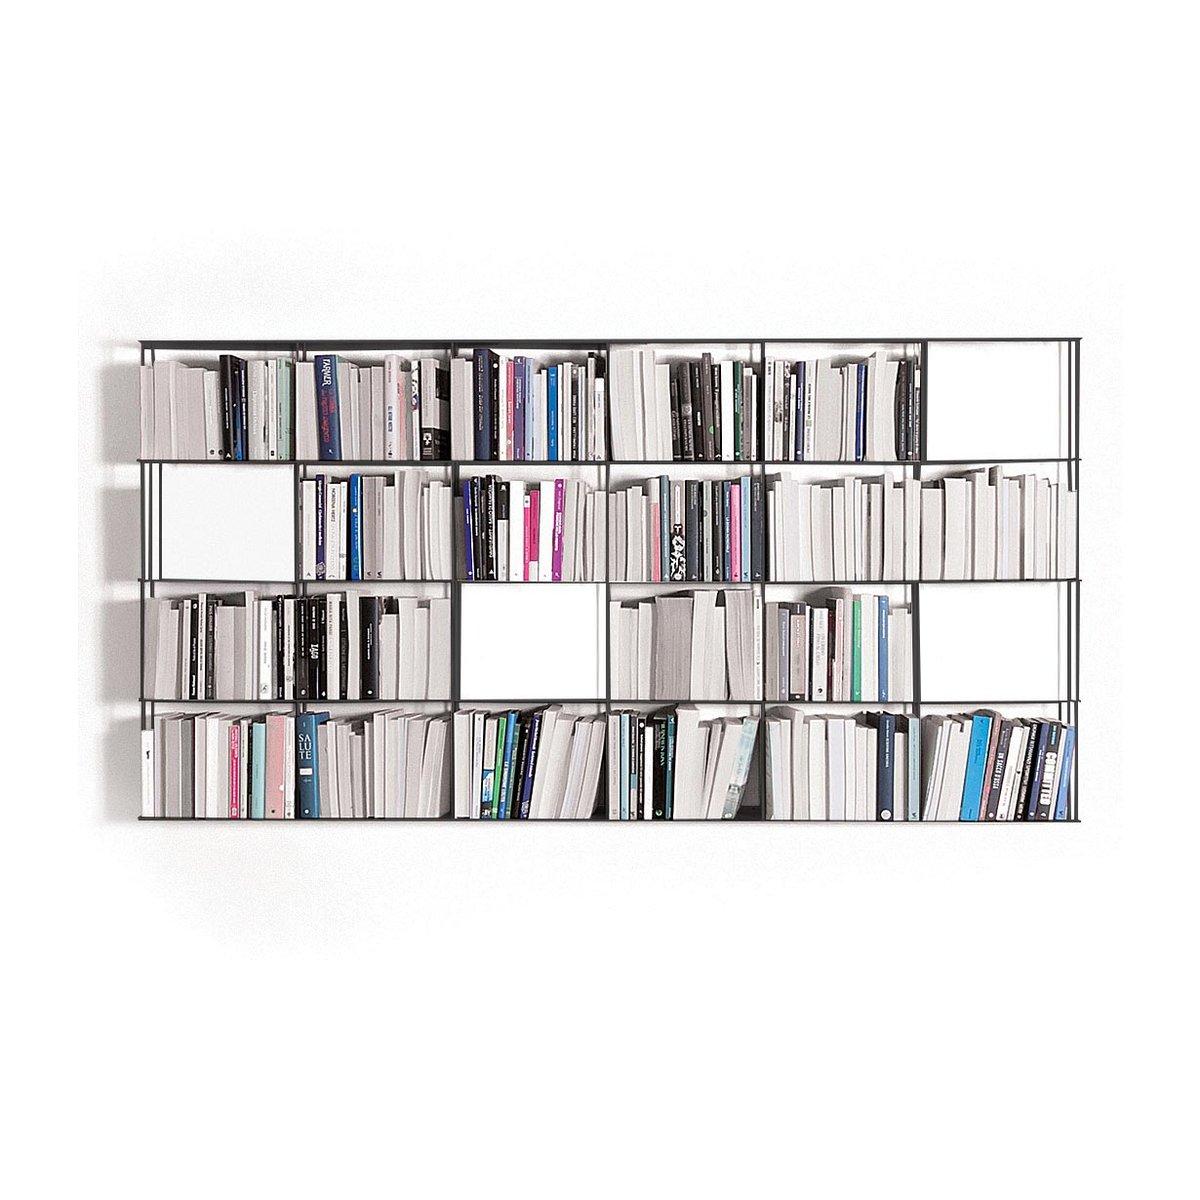 Libreria Profondità 15 Cm libreria da parete krossing 200xh100